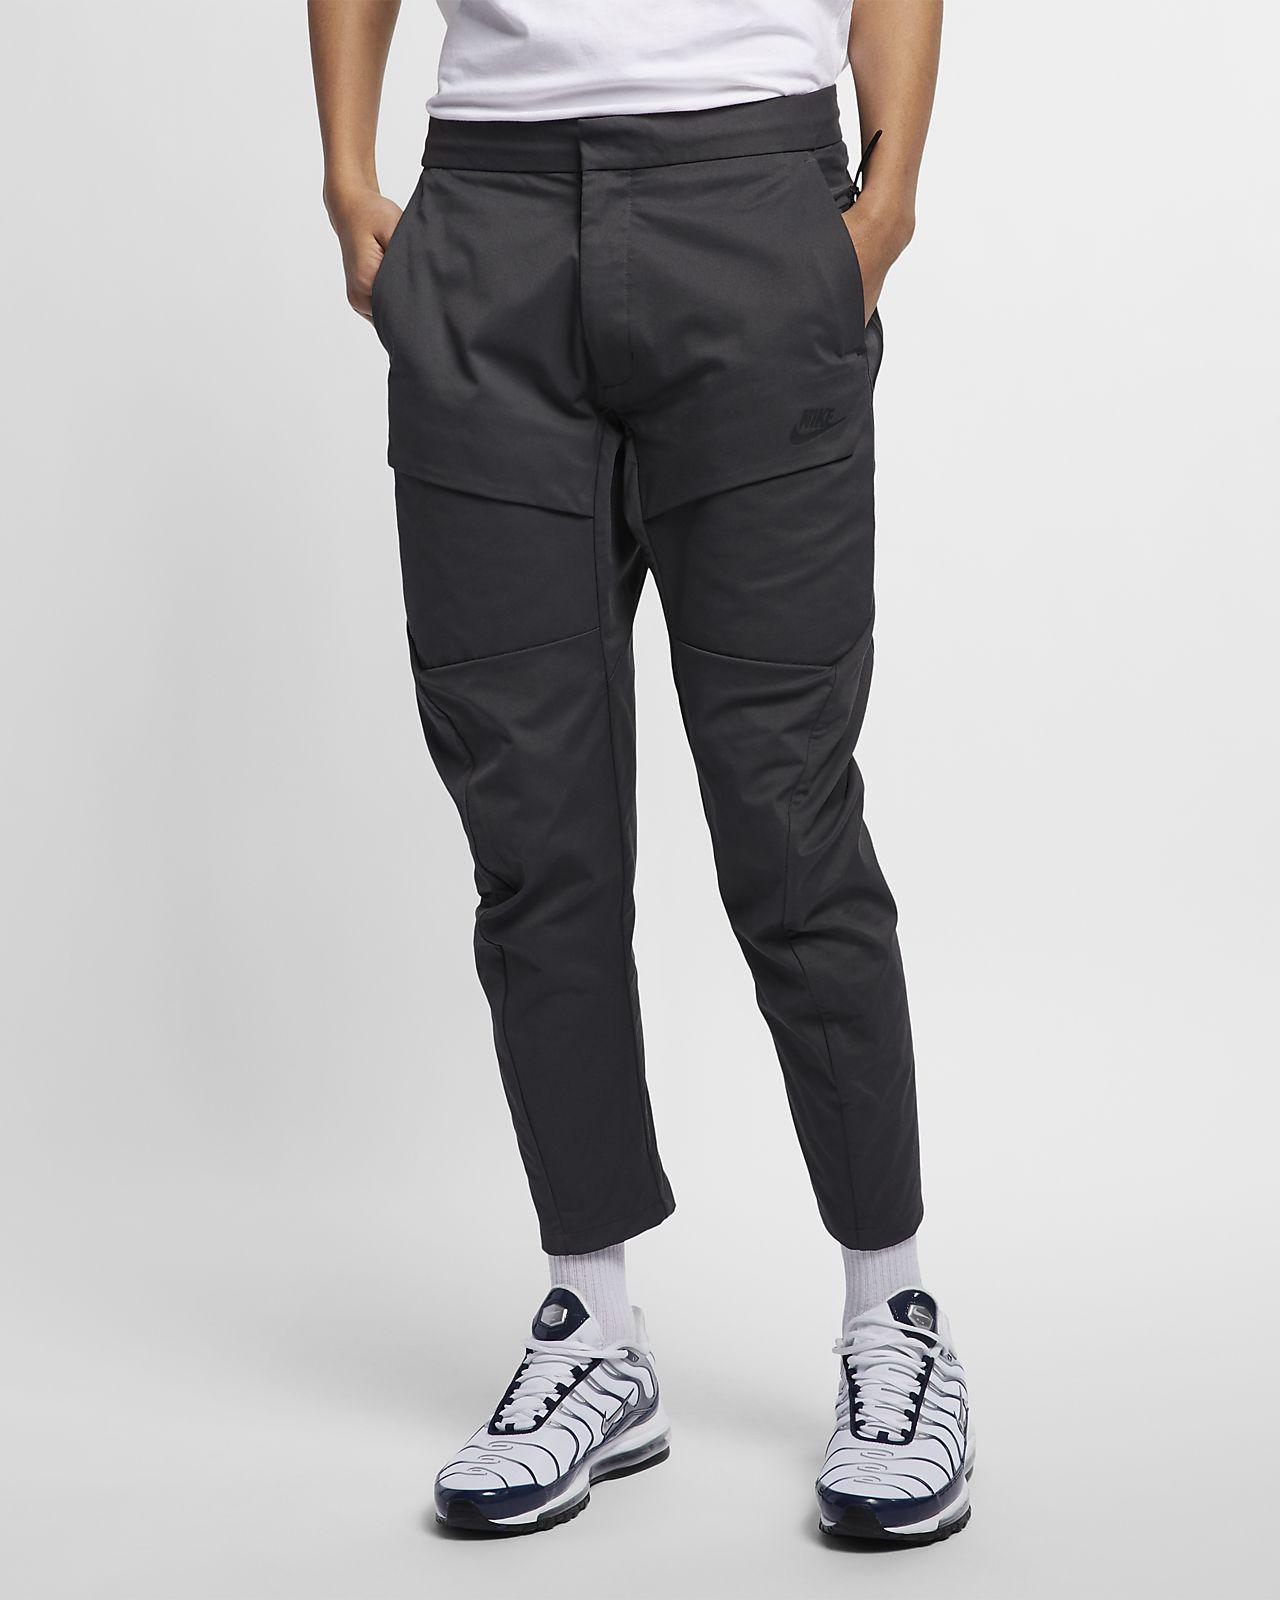 Nike Sportswear Tech Pack Men S Woven Cargo Pants Nike Com